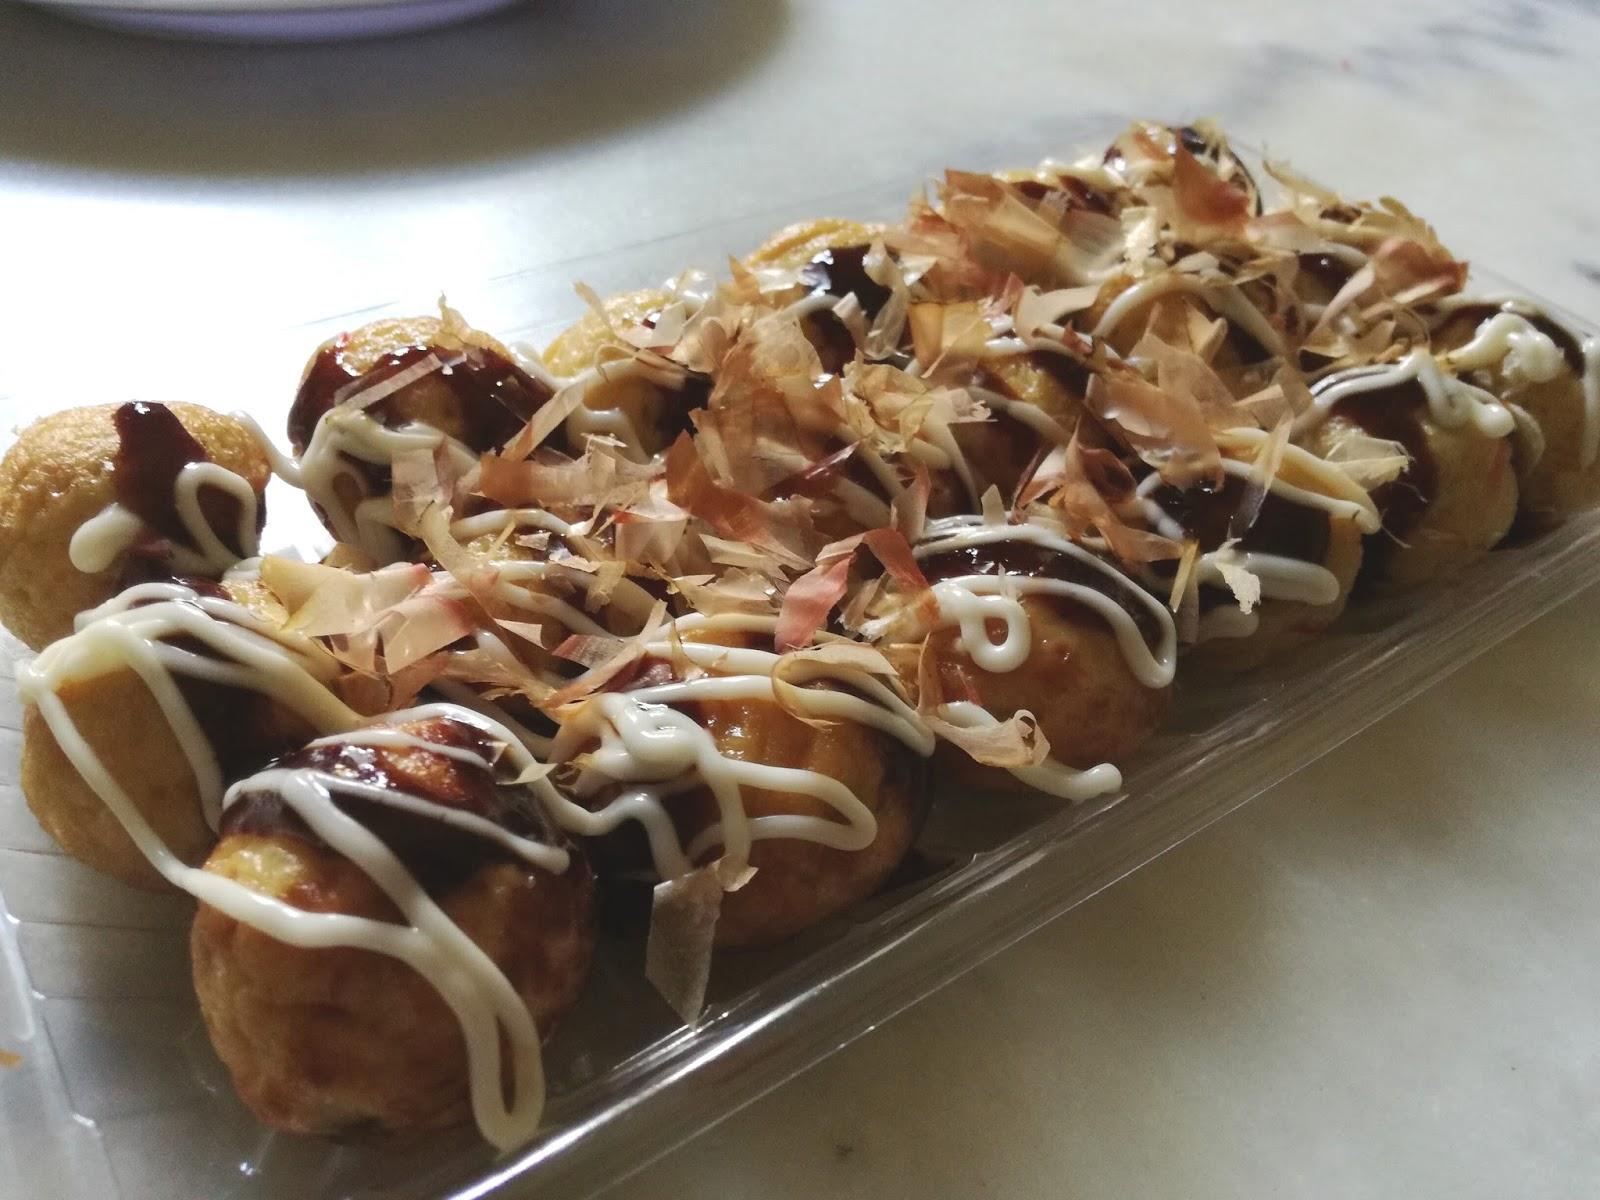 resepi takoyaki mudah  enak ieyracom Resepi Urap Turi Enak dan Mudah